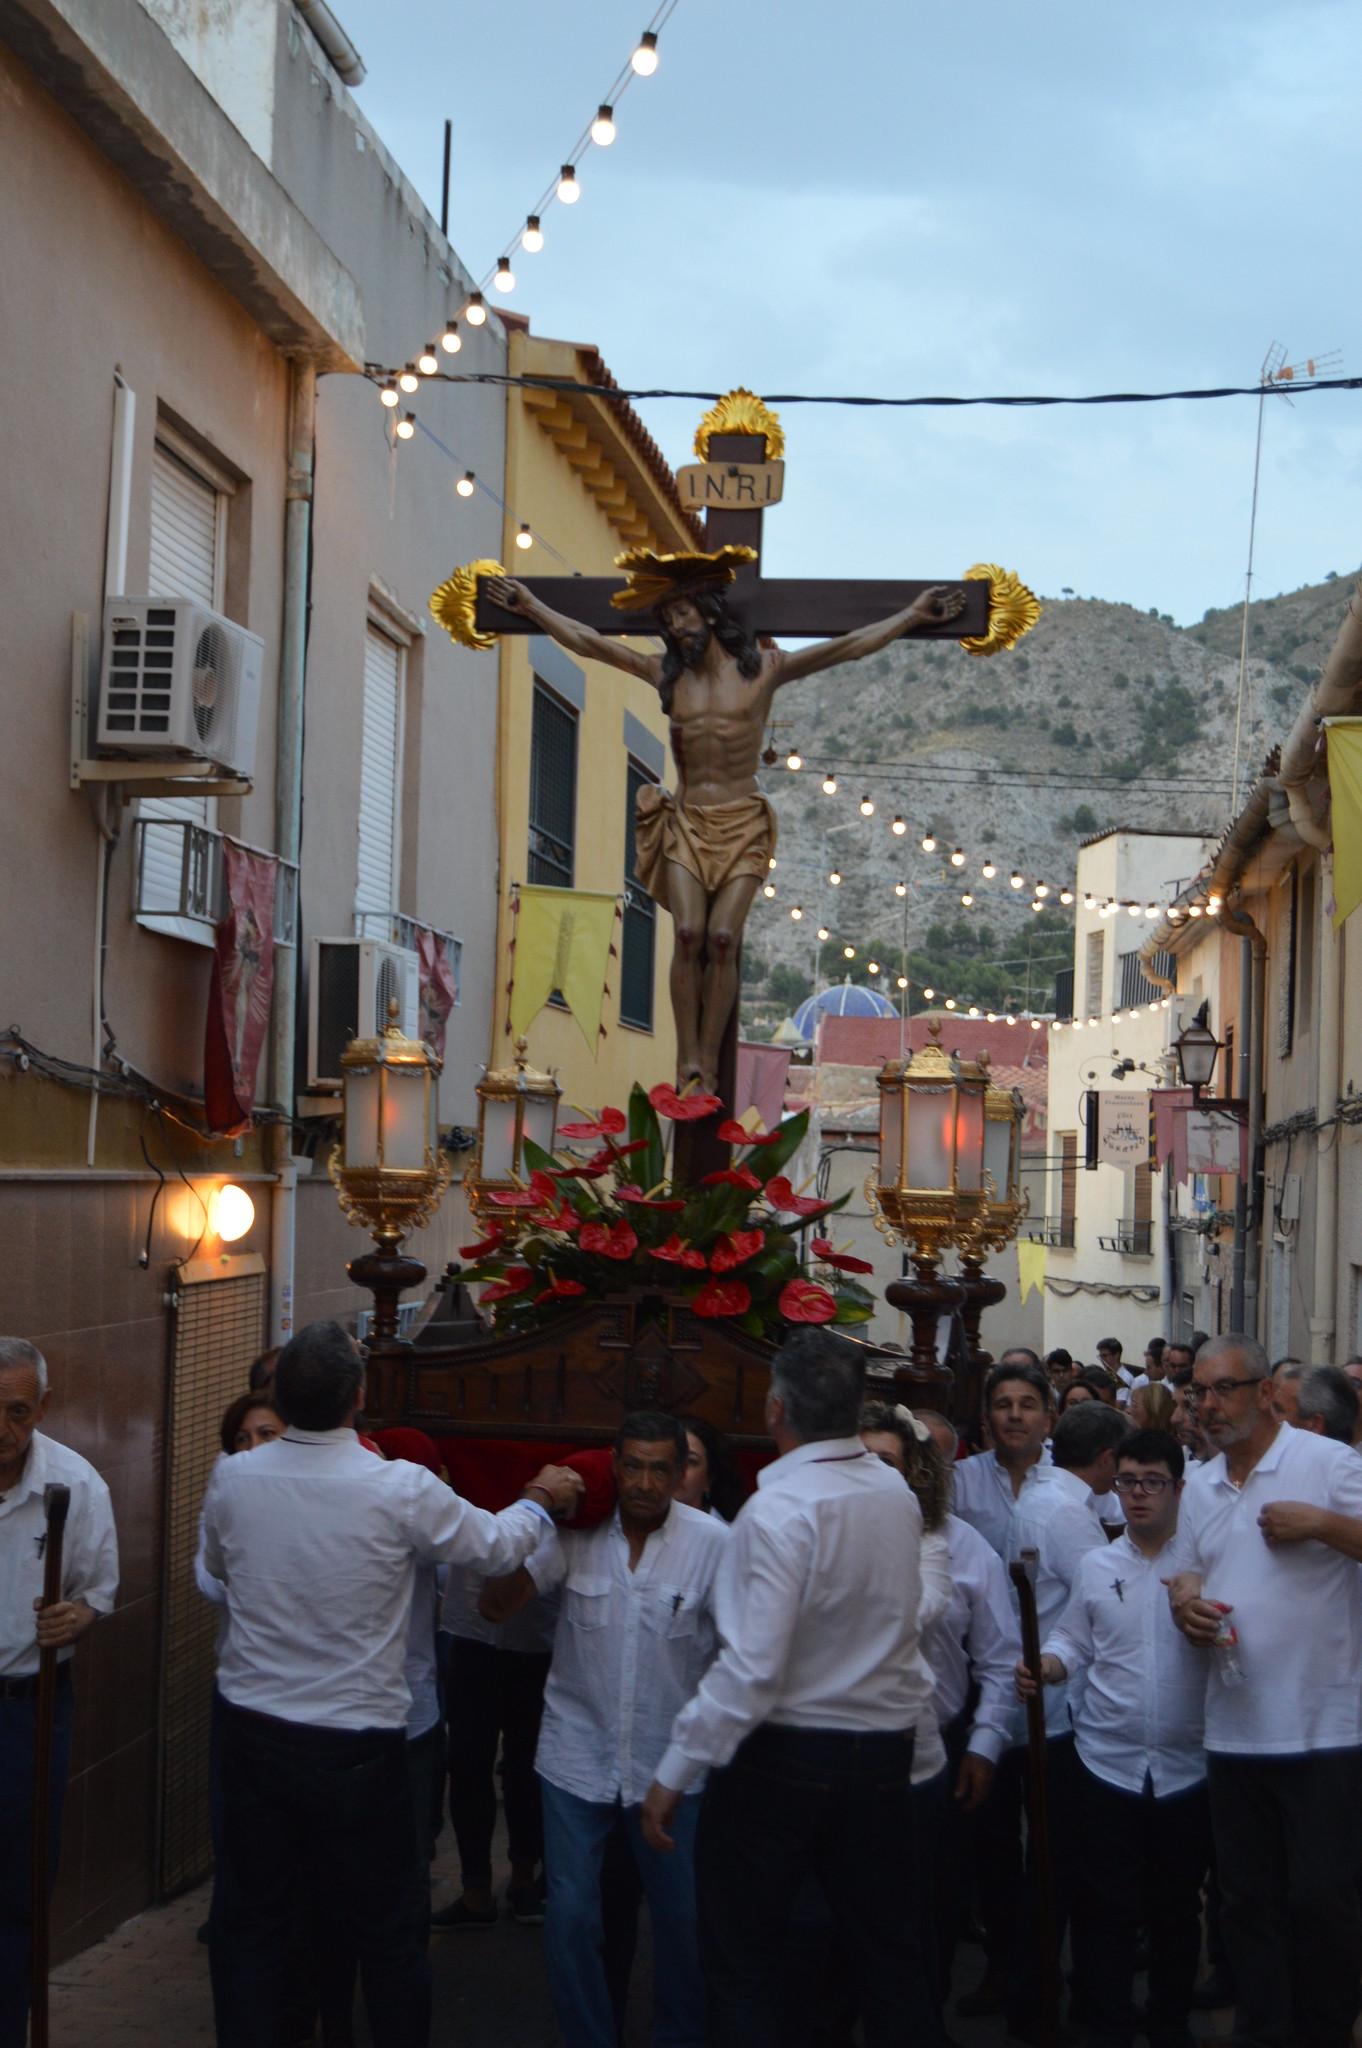 (2019-07-07) Procesión de subida - Adrián Romero Montesinos (21)